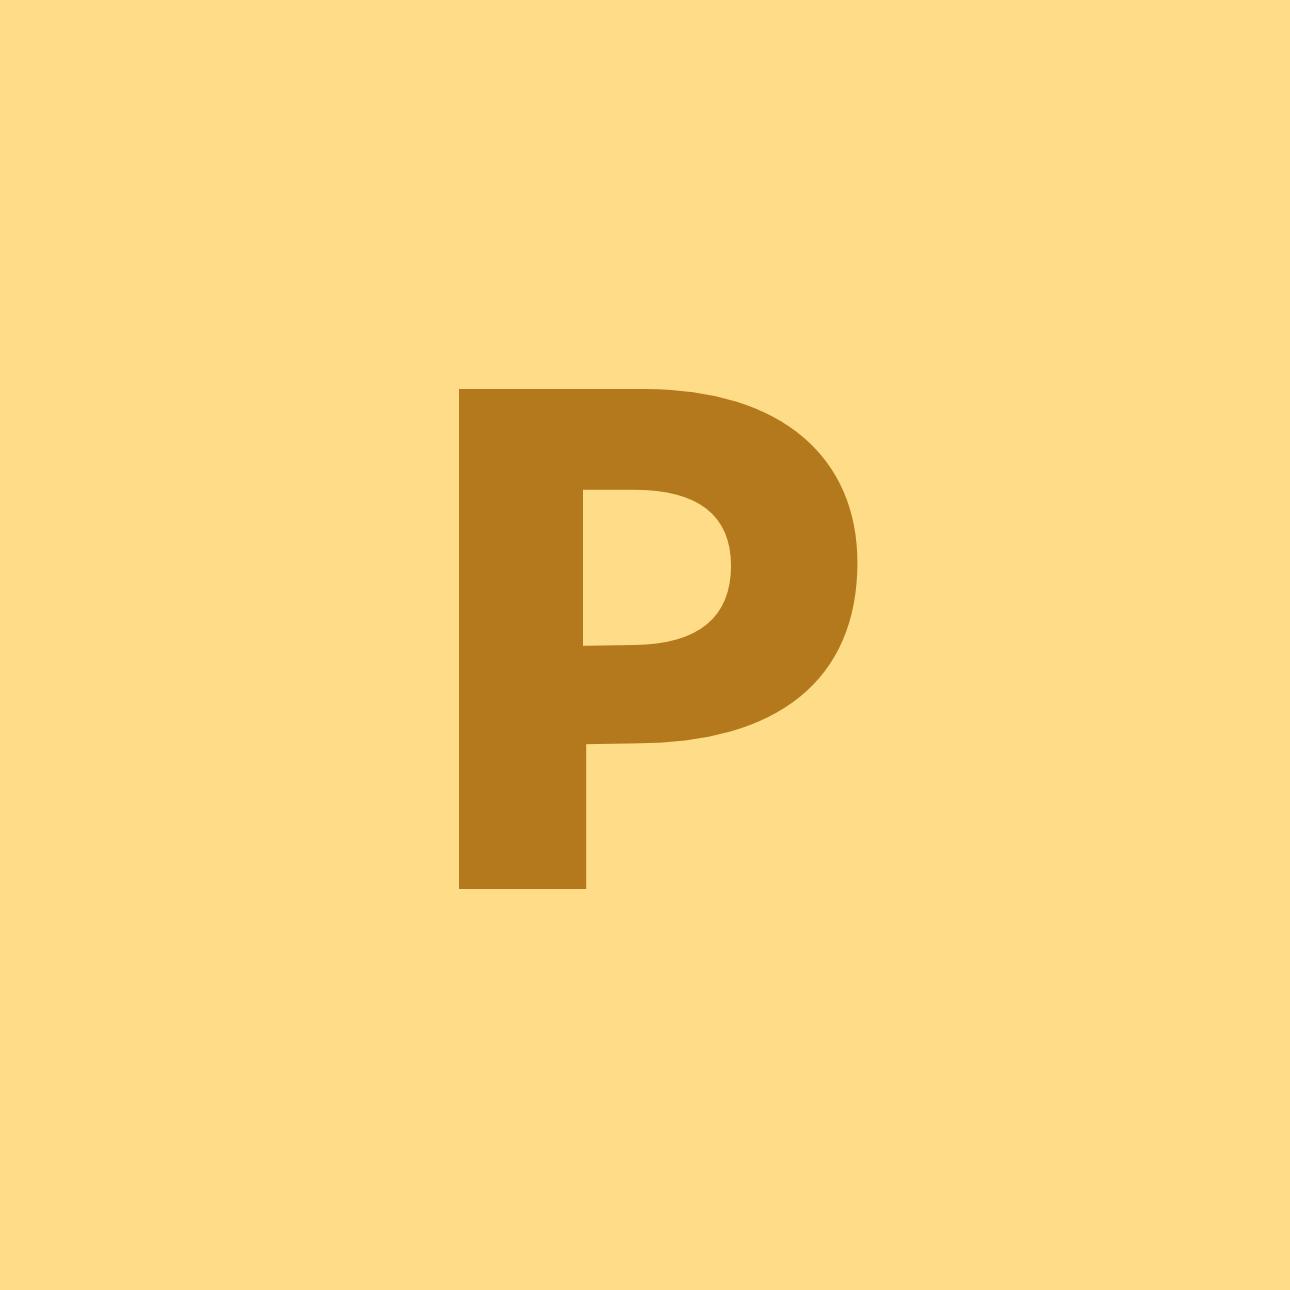 Patrik's Water Hauling Ltd logo